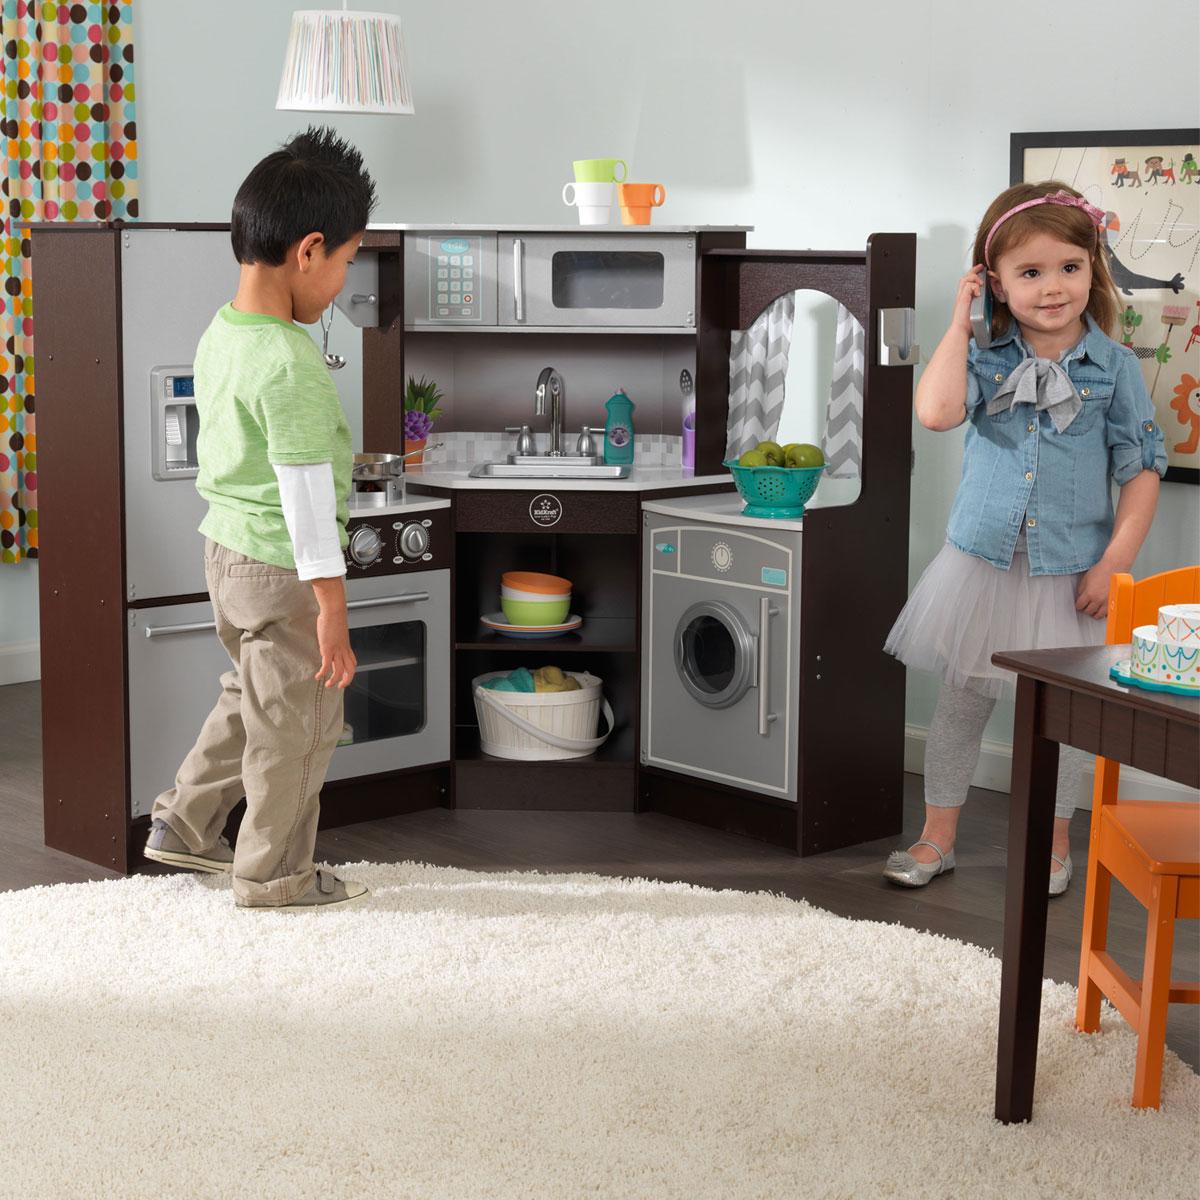 KidKraft Ulitmate Corner Play Kitchen W/lights And Sounds